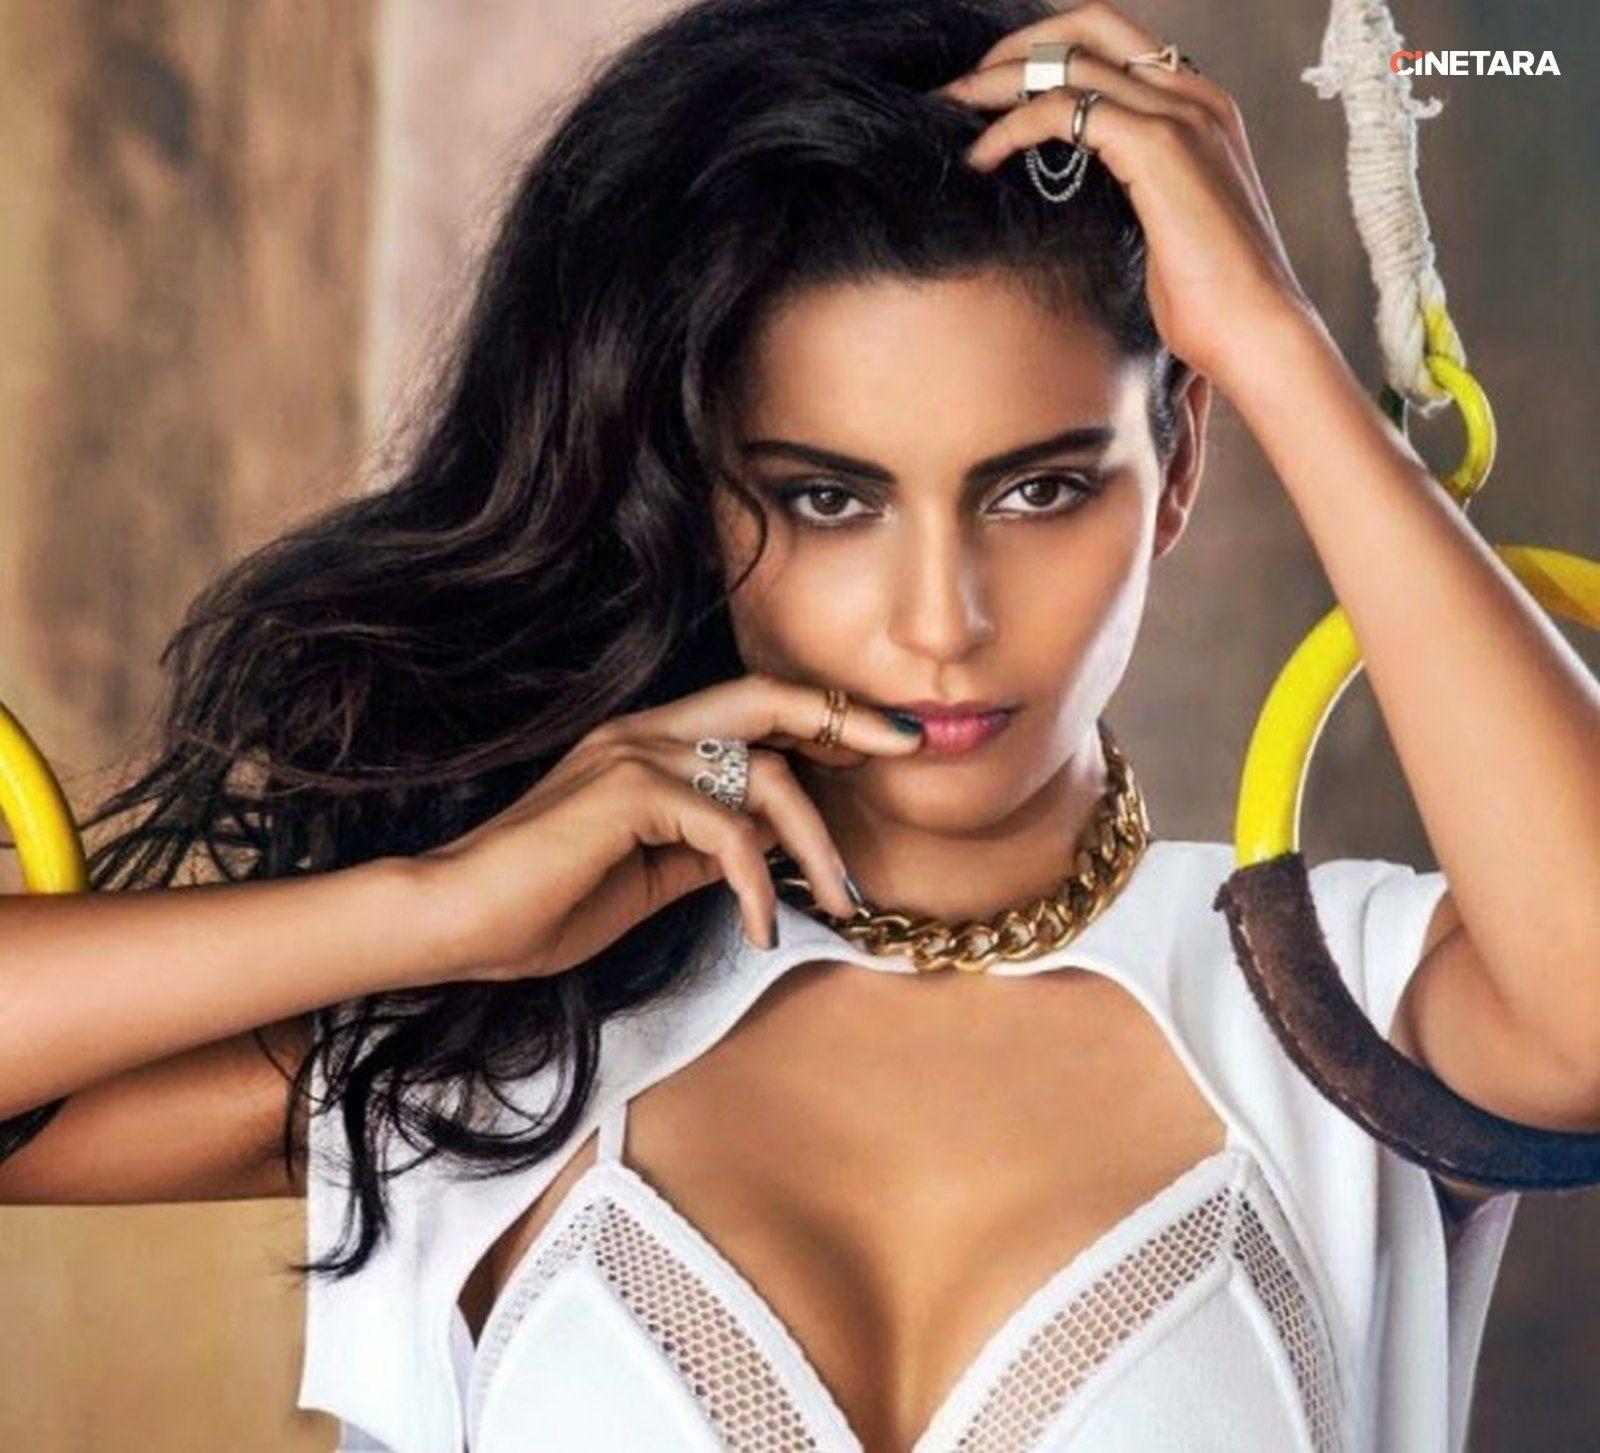 kangana ranaut vogue hot photos showing cleavage | kamapisachi-hd